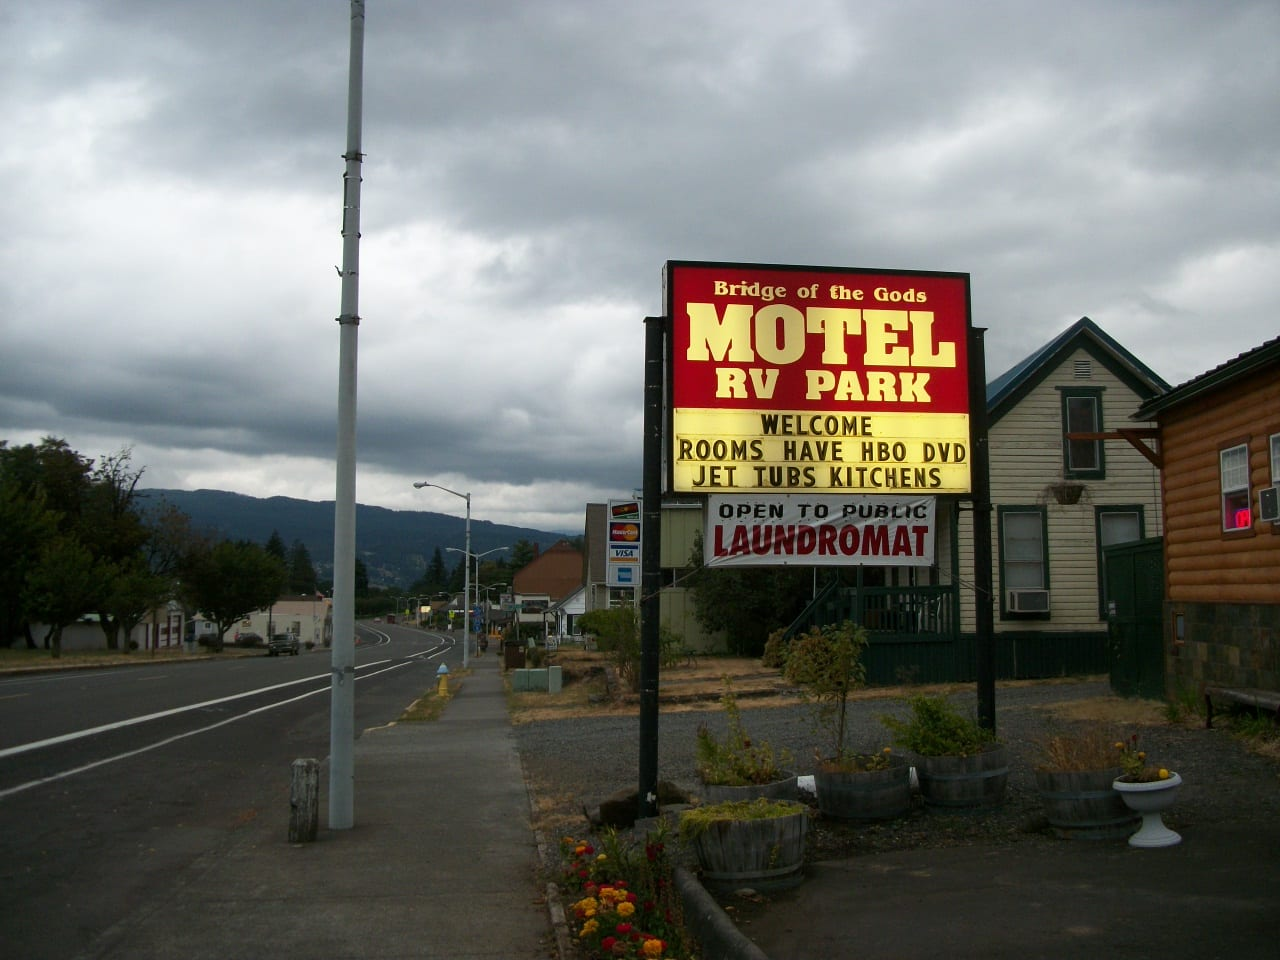 A Motel / RV Park sign